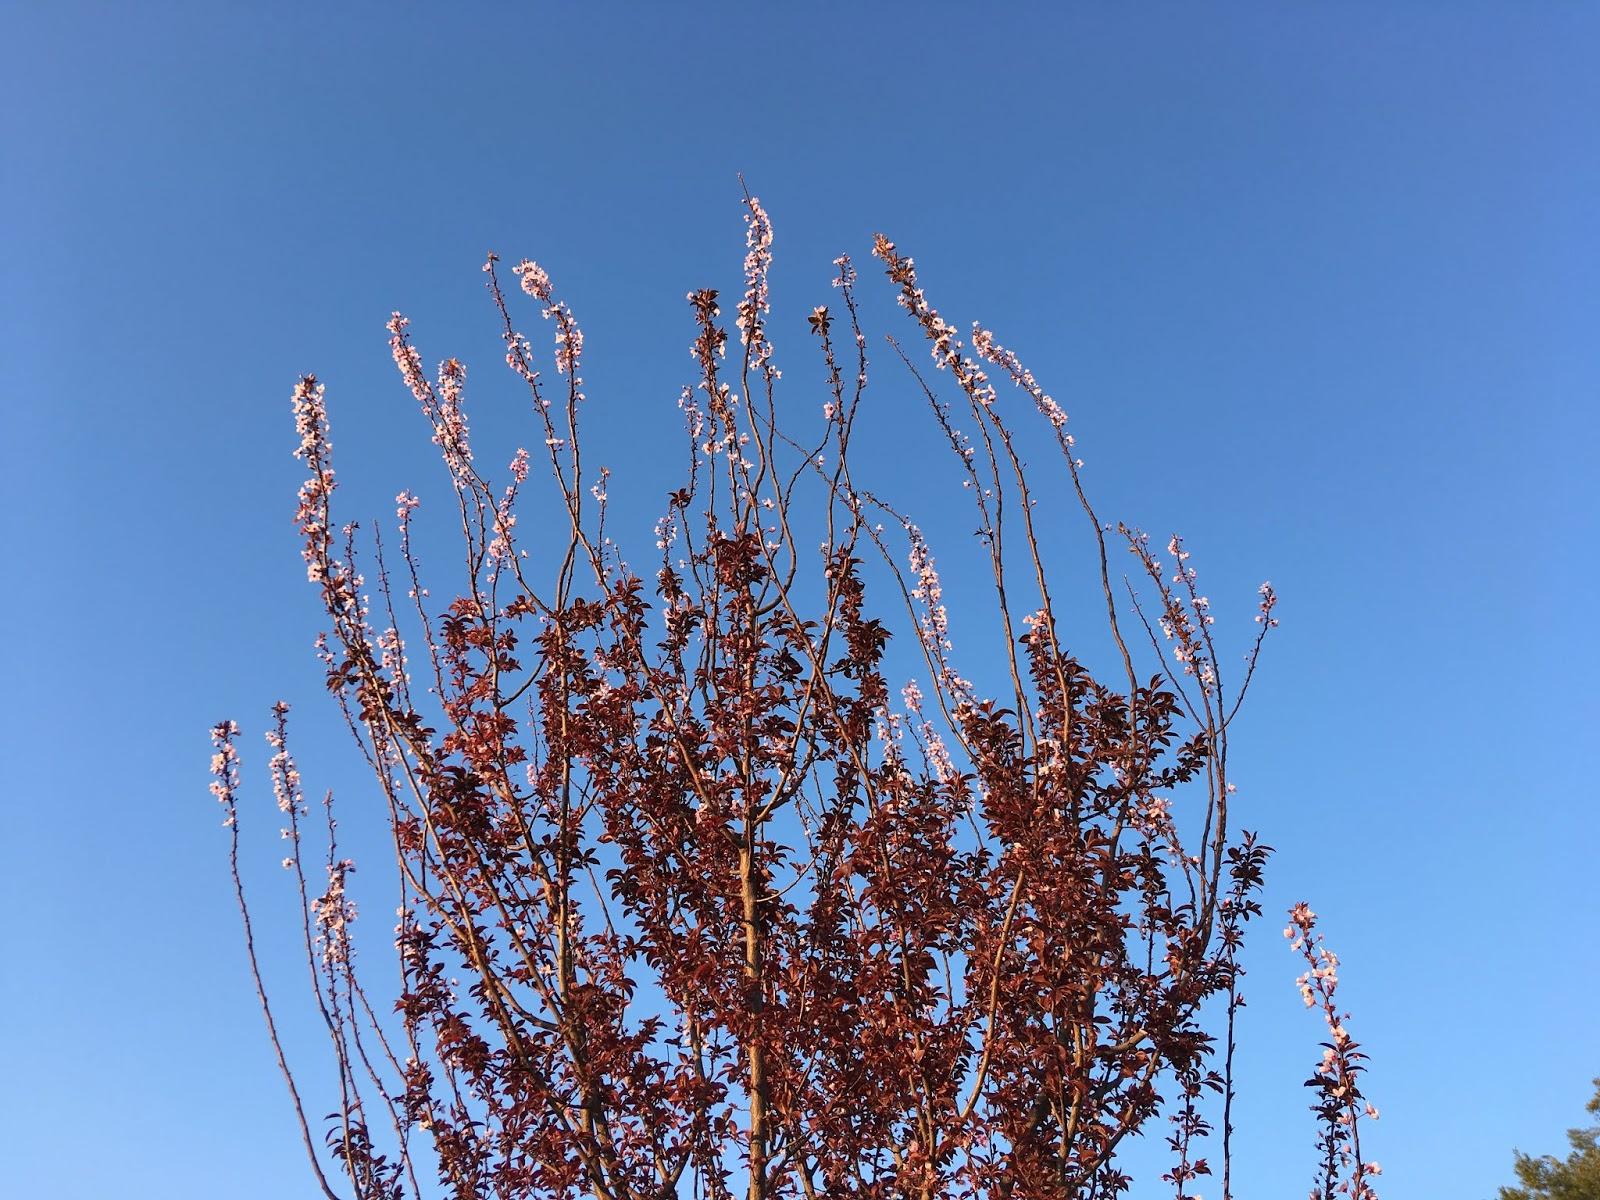 Prunus. Yecla, 21/03/2019